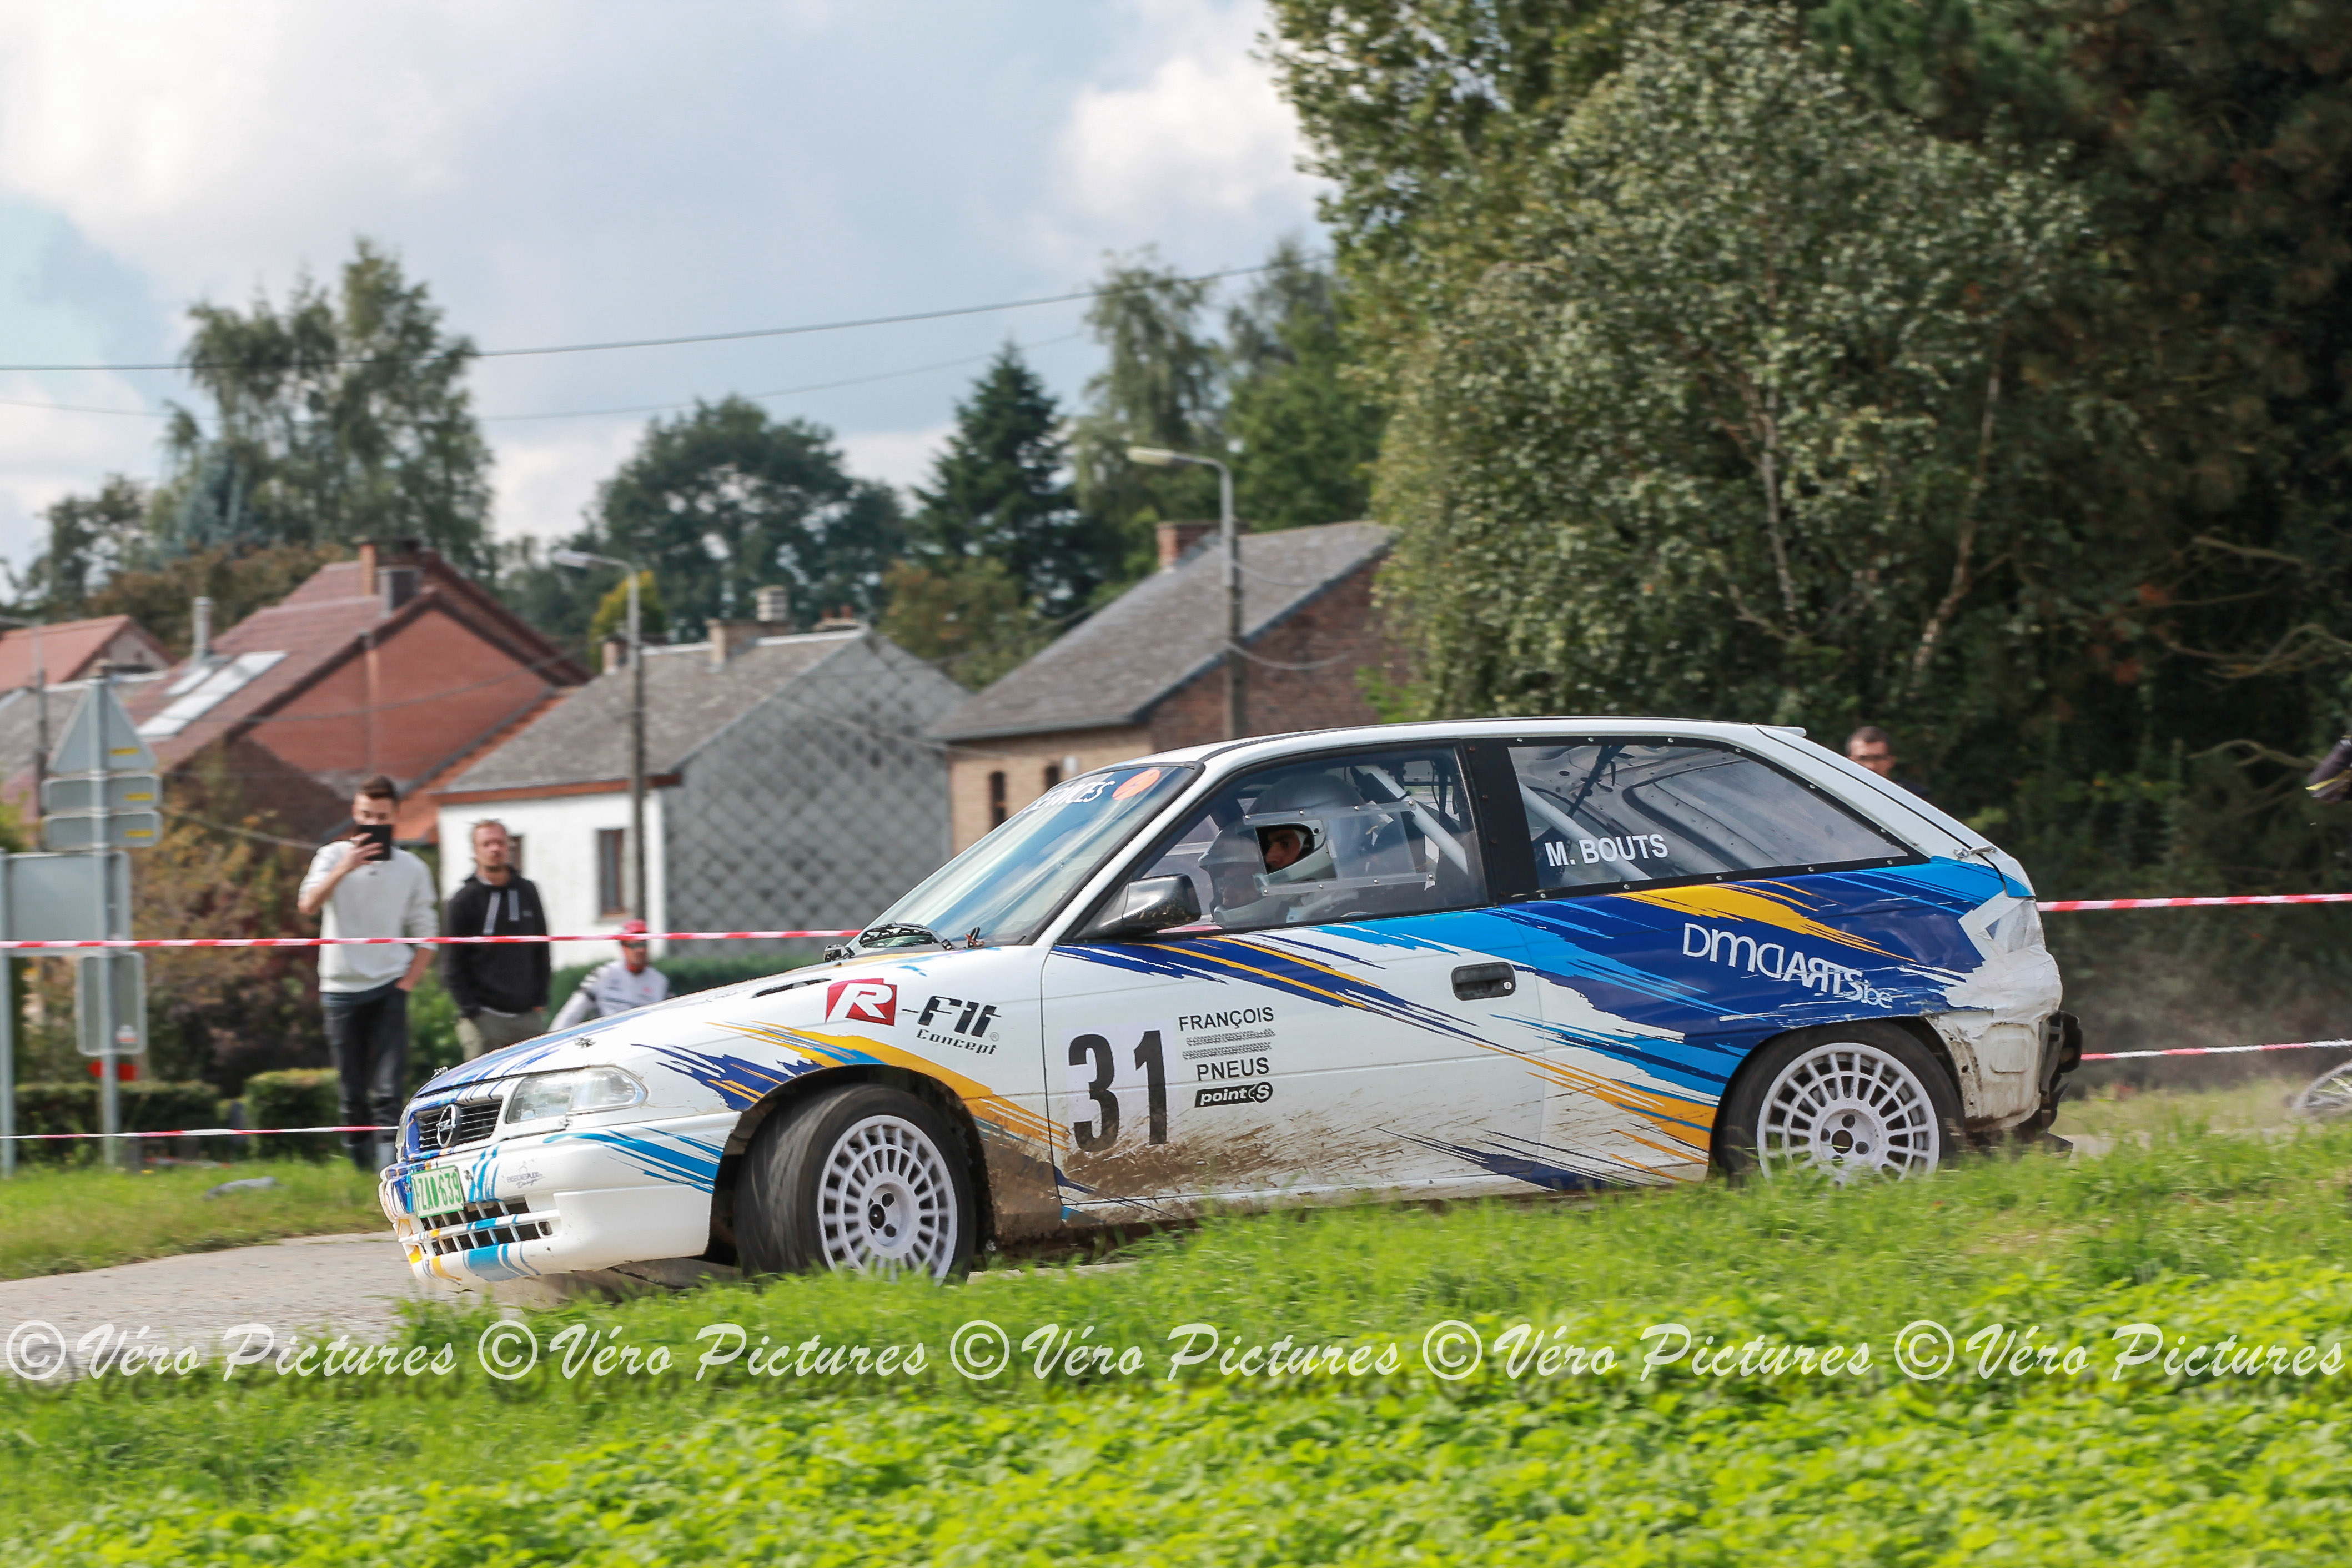 Rallye Jean-Louis Dumont 2017 Bouts